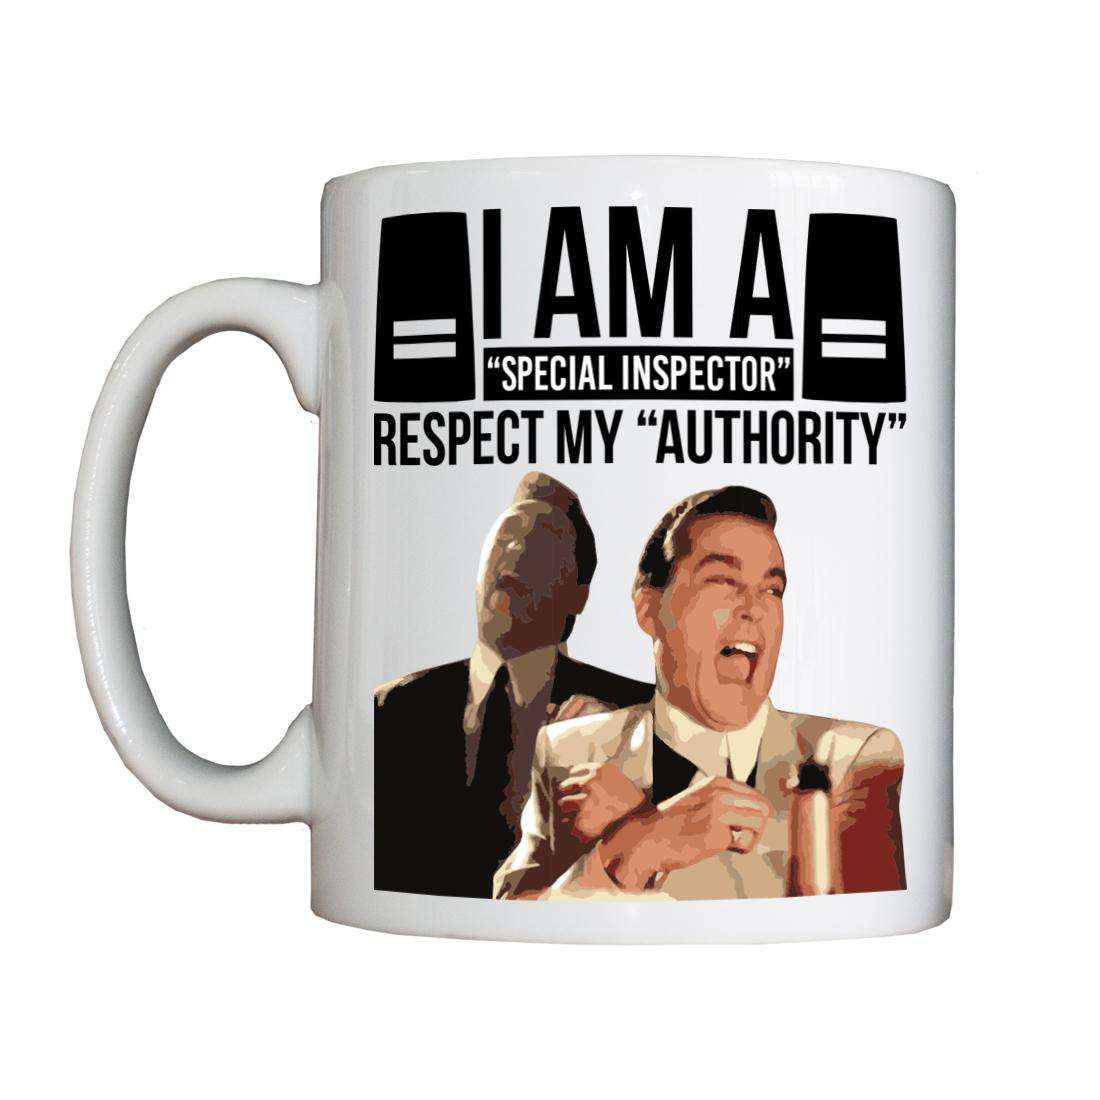 Personalised 'I am a Special Inspector' Drinking Vessel (Mug) SpecialInspectorVessel